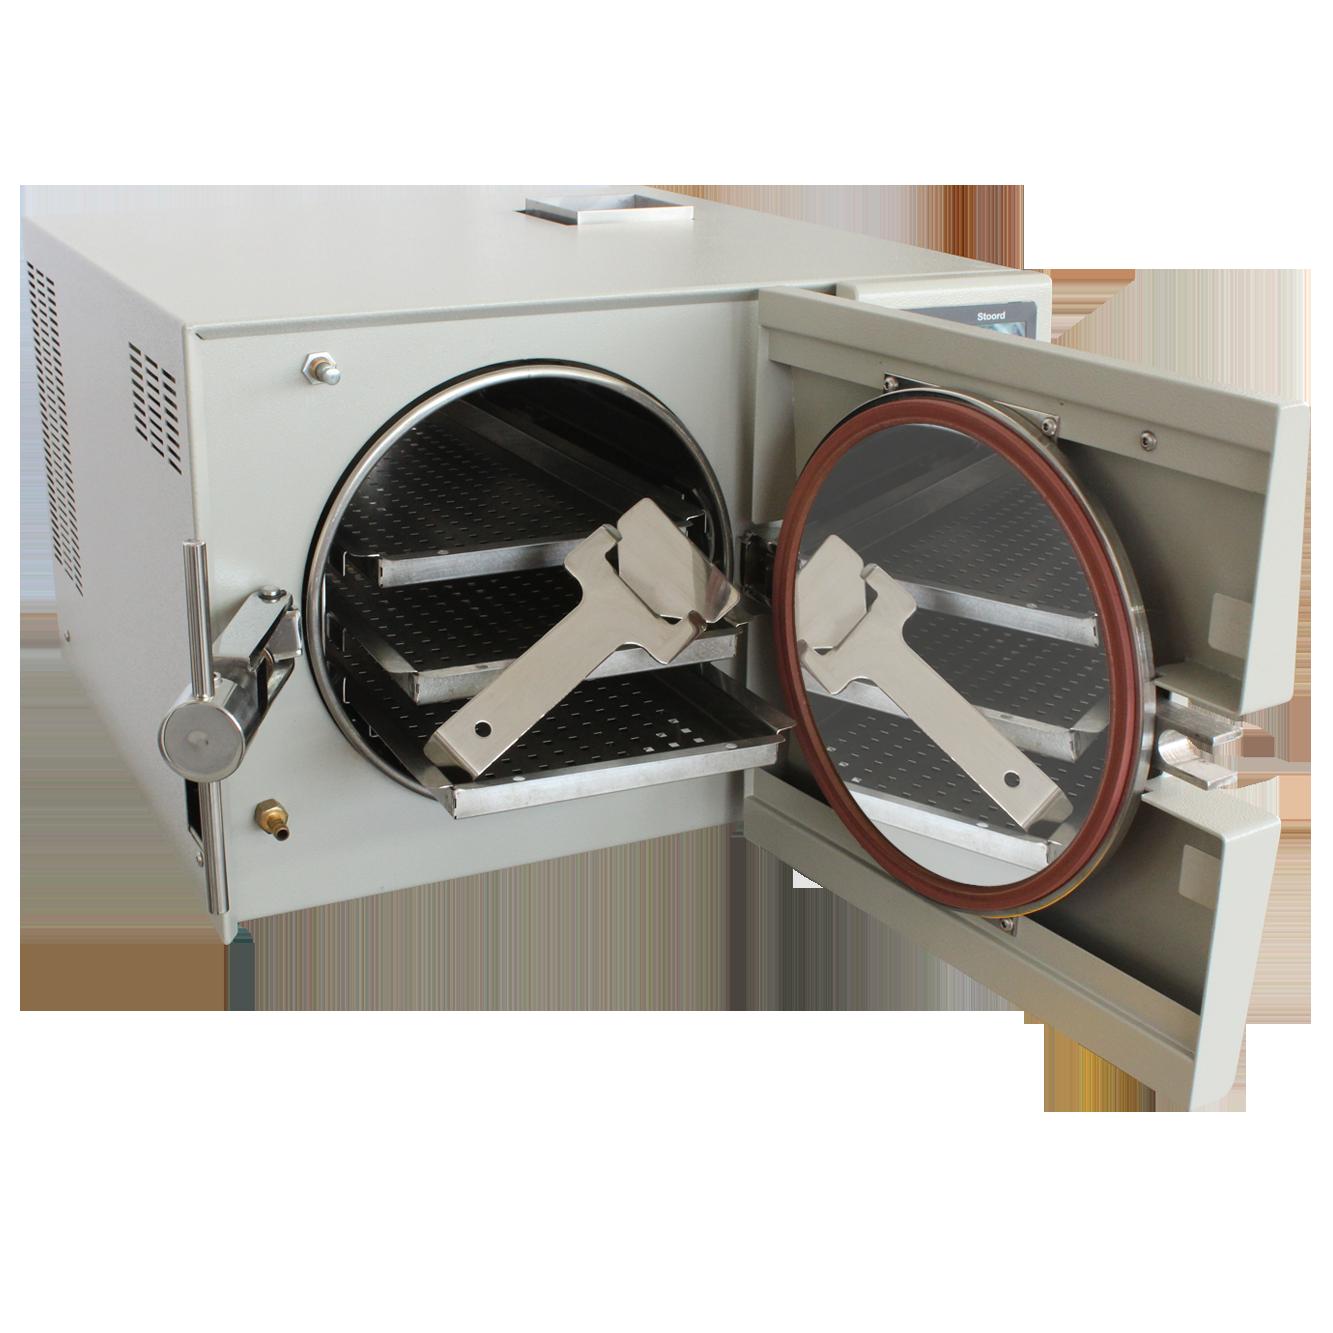 Autoclave Automático EAV-21 CLASE B PA